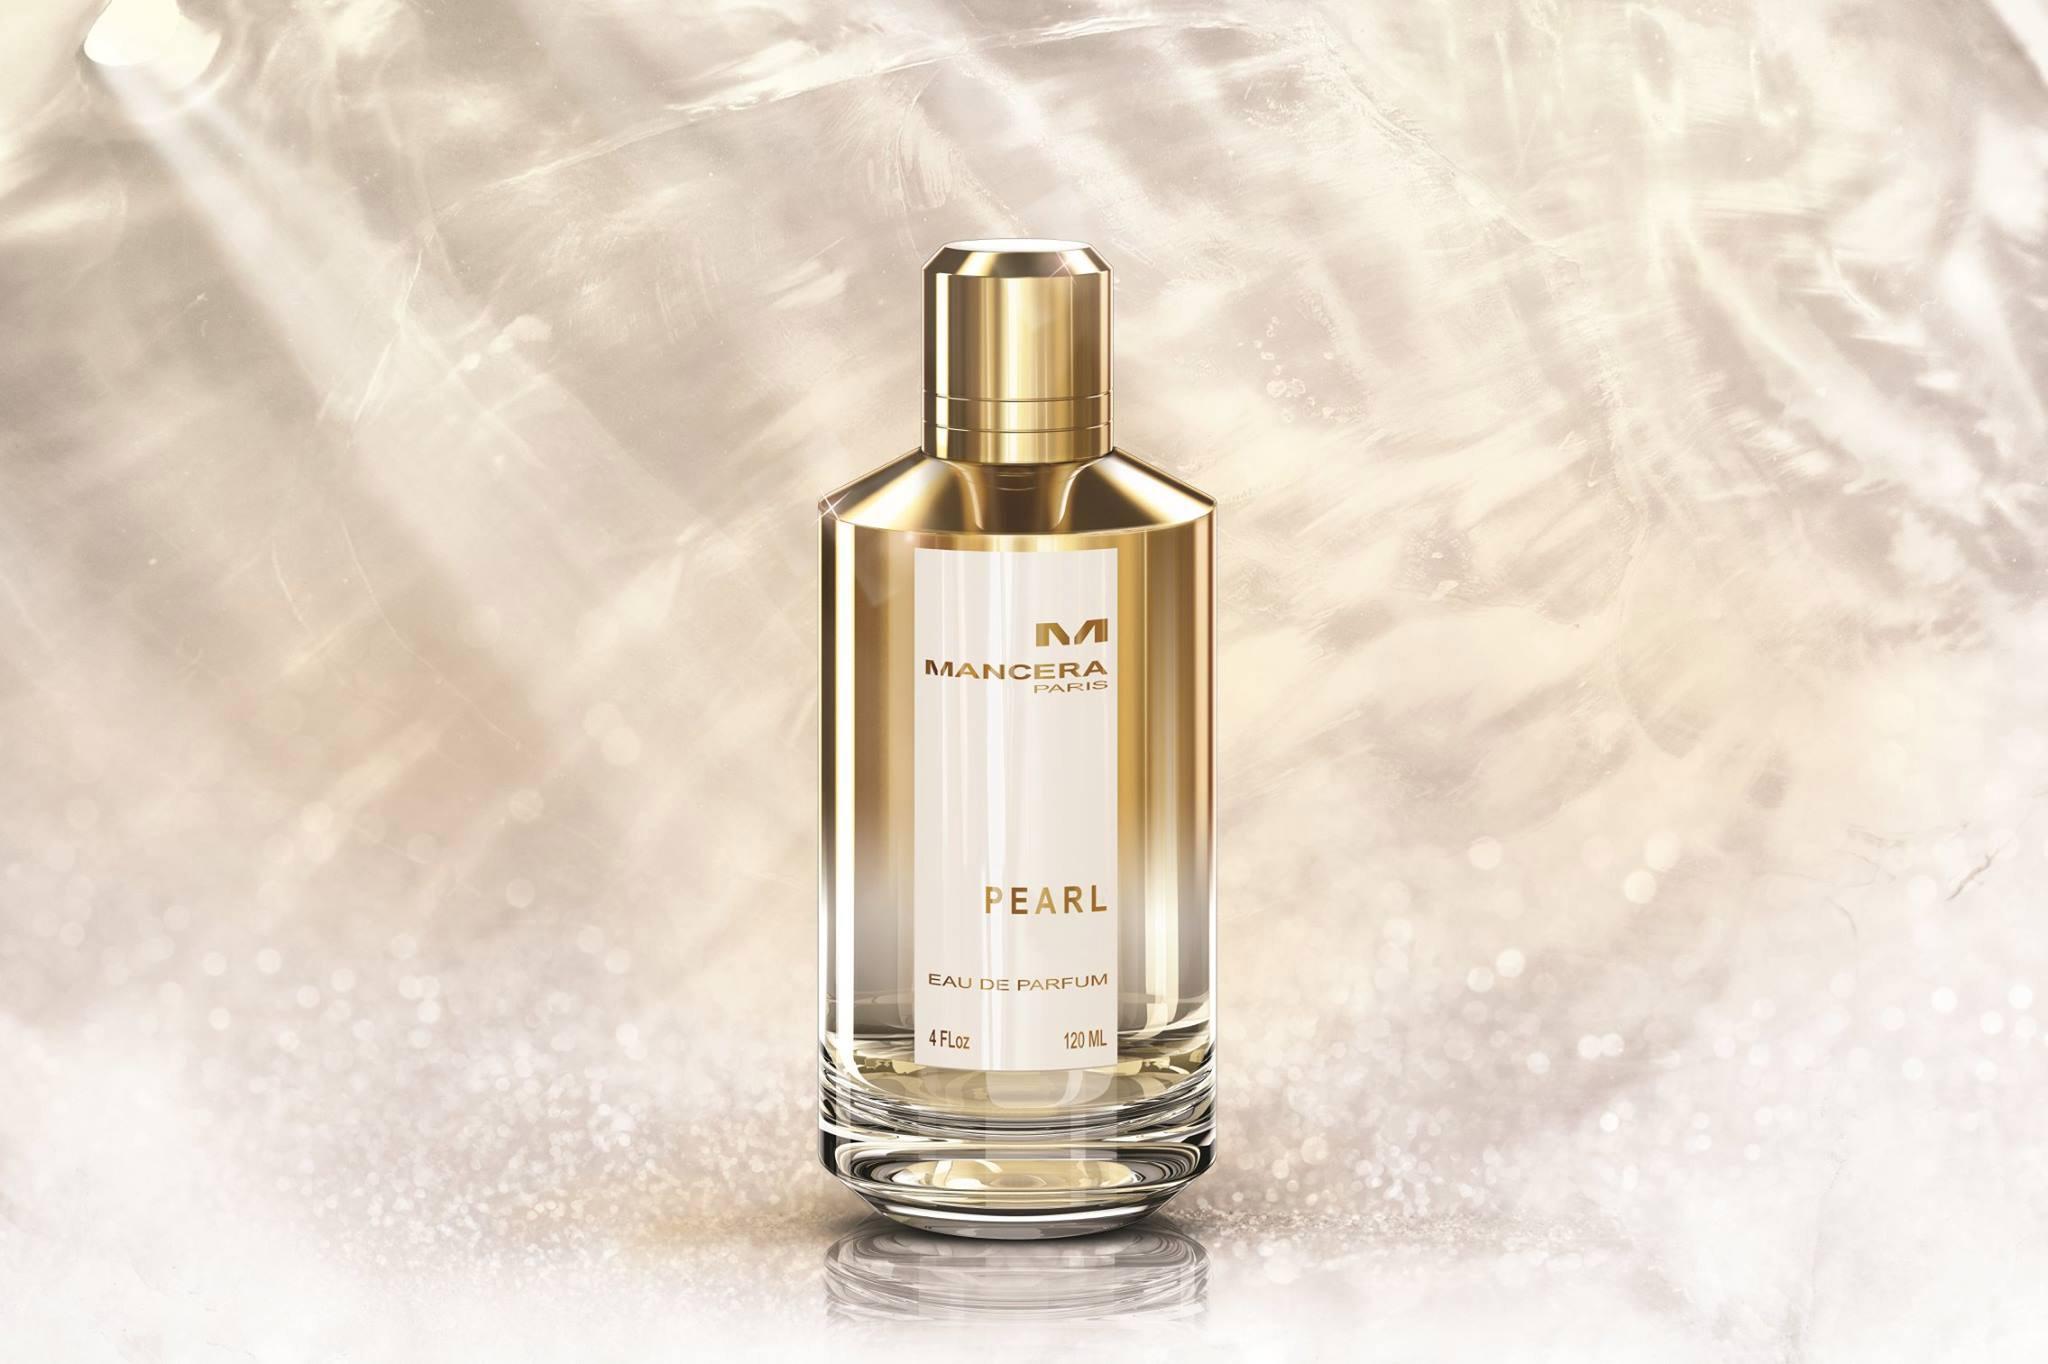 Pearl Mancera perfume - a new fragrance for women 2016